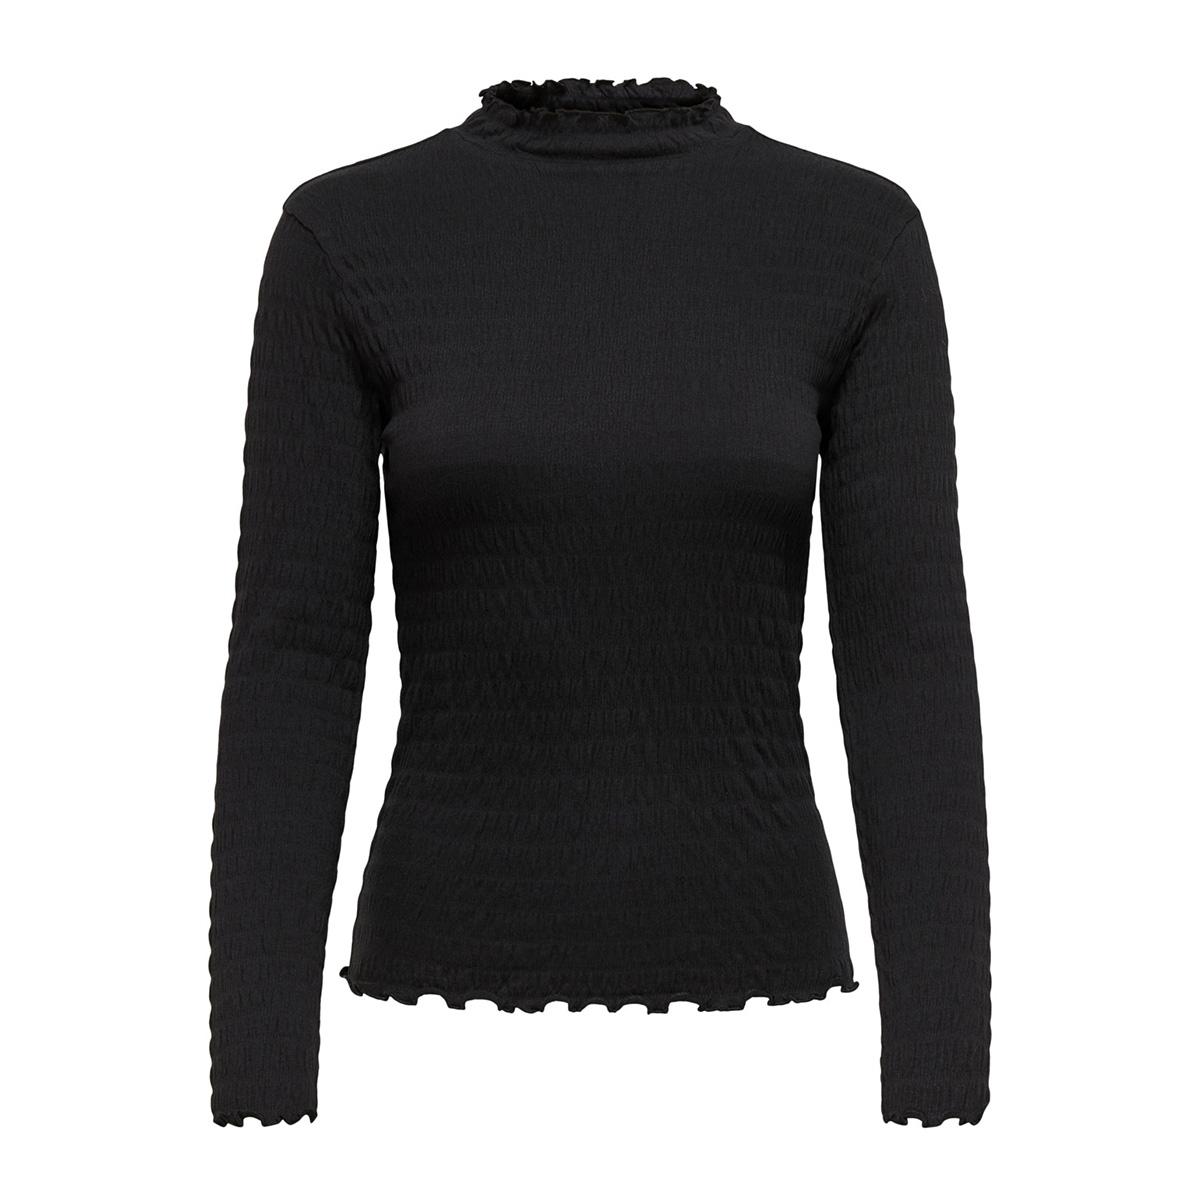 jdyshilda l/s highneck top jrs 15187978 jacqueline de yong t-shirt black/stripe